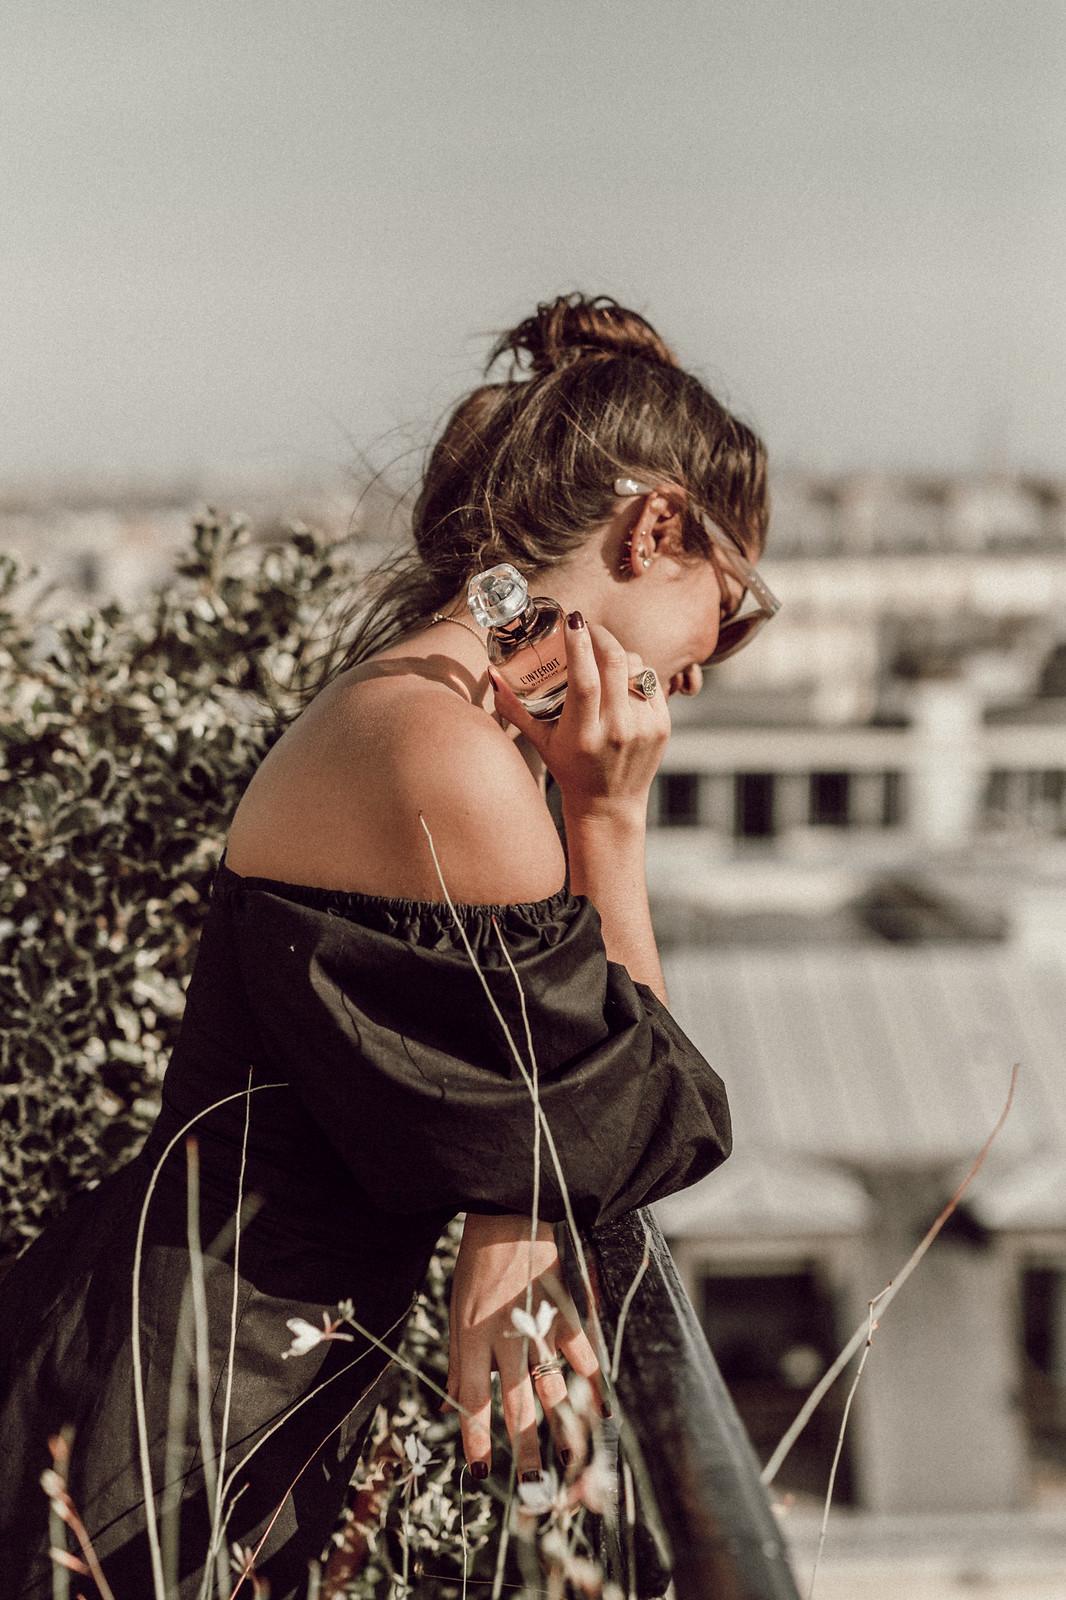 Jessie Chanes - Seams for a desire -4